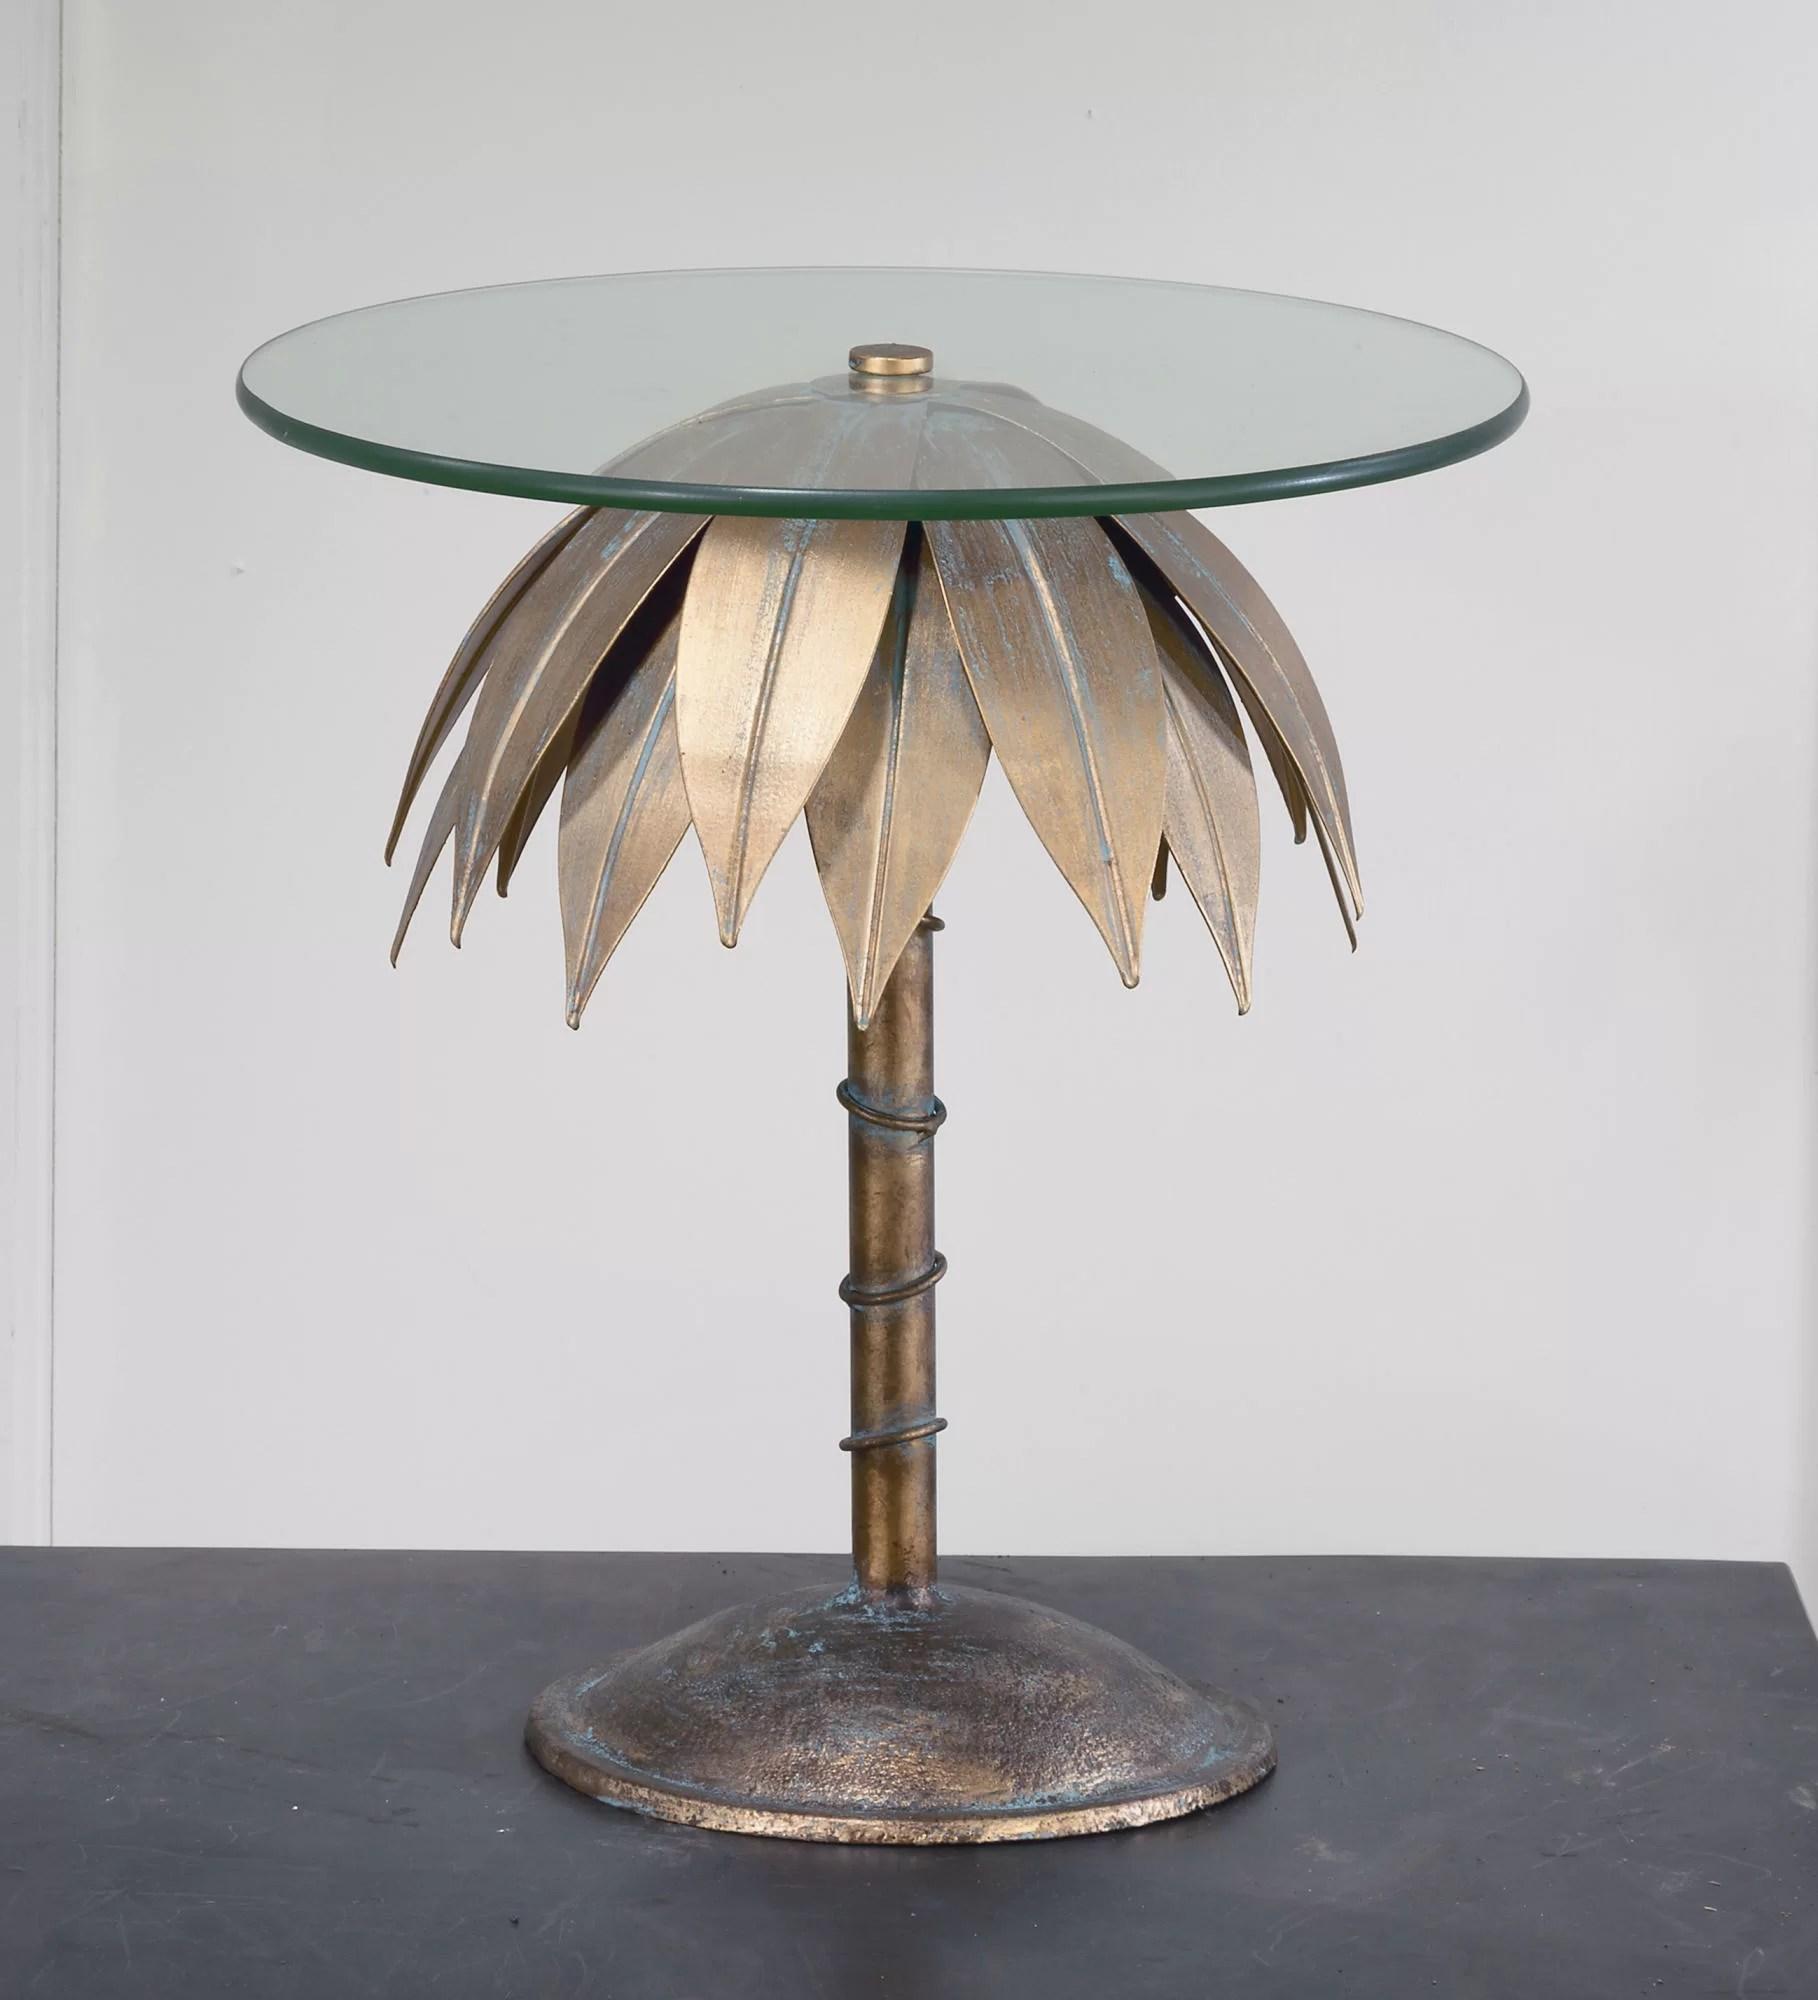 tiberius glass top tree stump end table